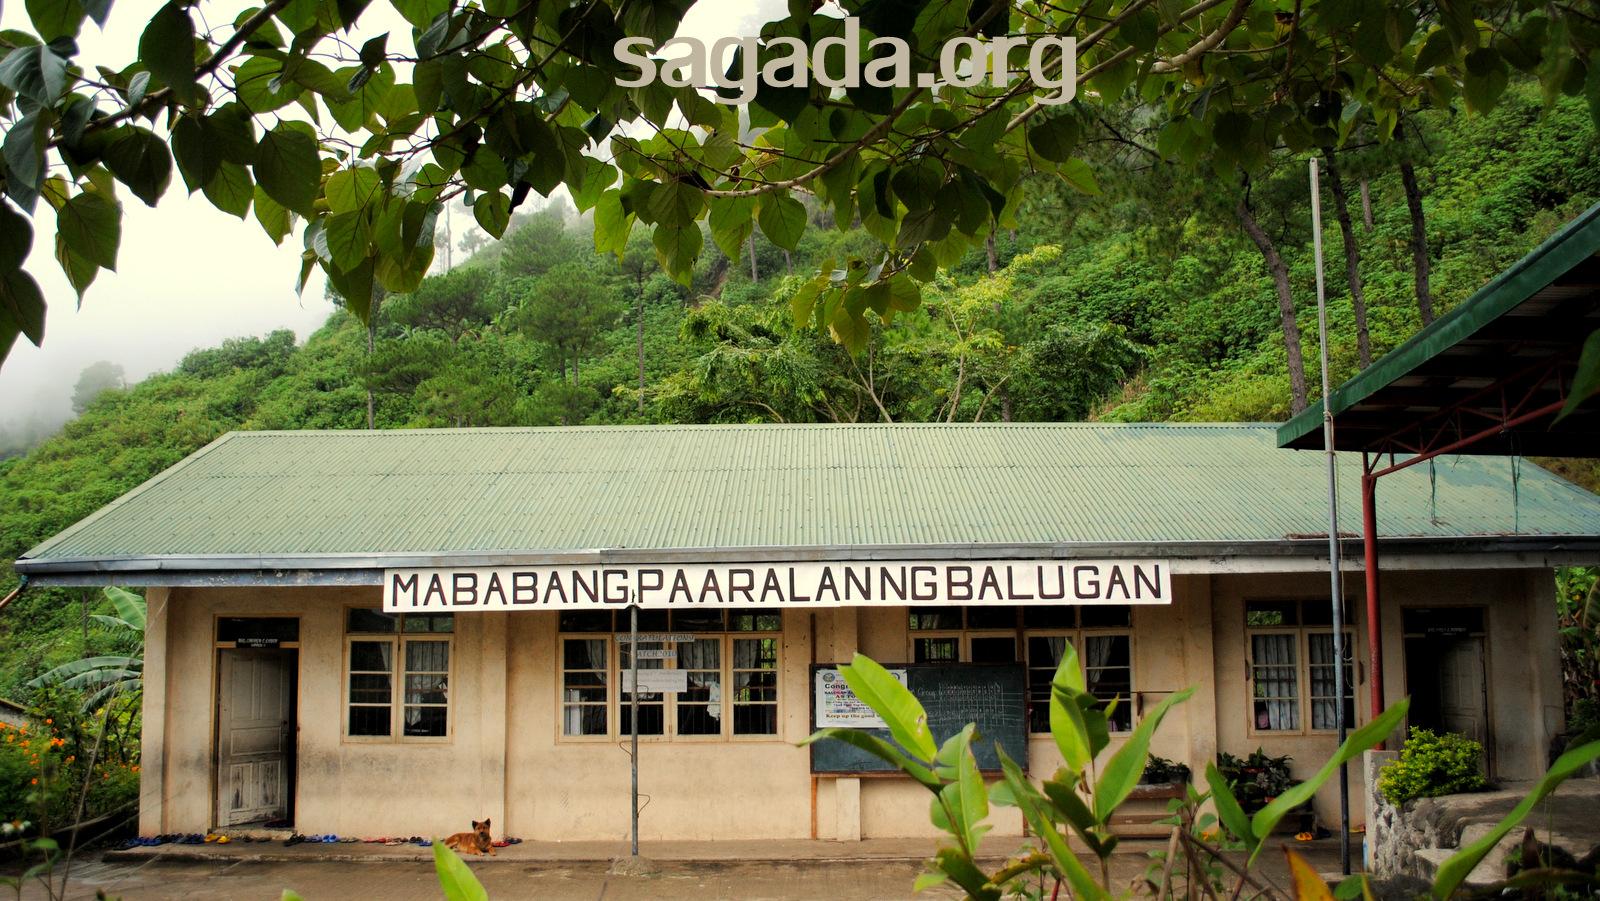 Balugan Elementary School, Sagada 2011